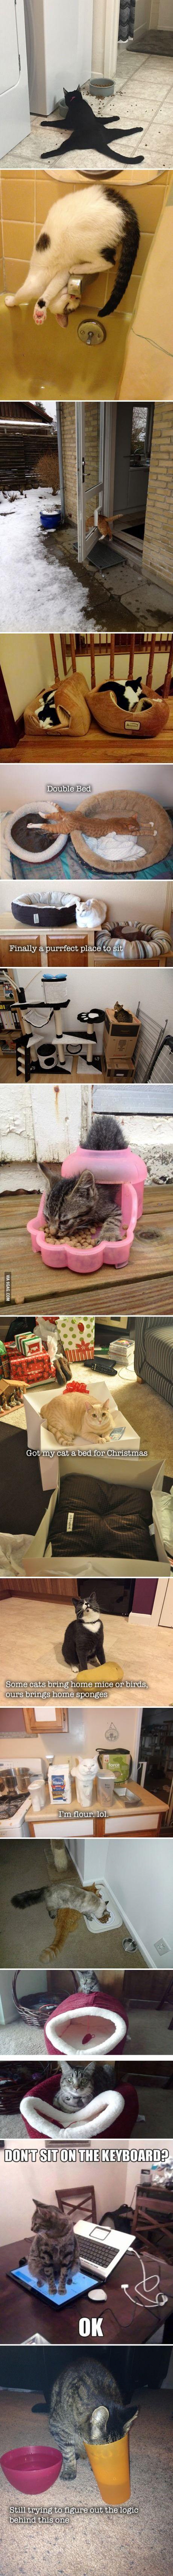 nice 15 Hilarious Examples Of Cat Logics by http://dezdemon-humor-addiction.xyz/funny-animal-humor/15-hilarious-examples-of-cat-logics/